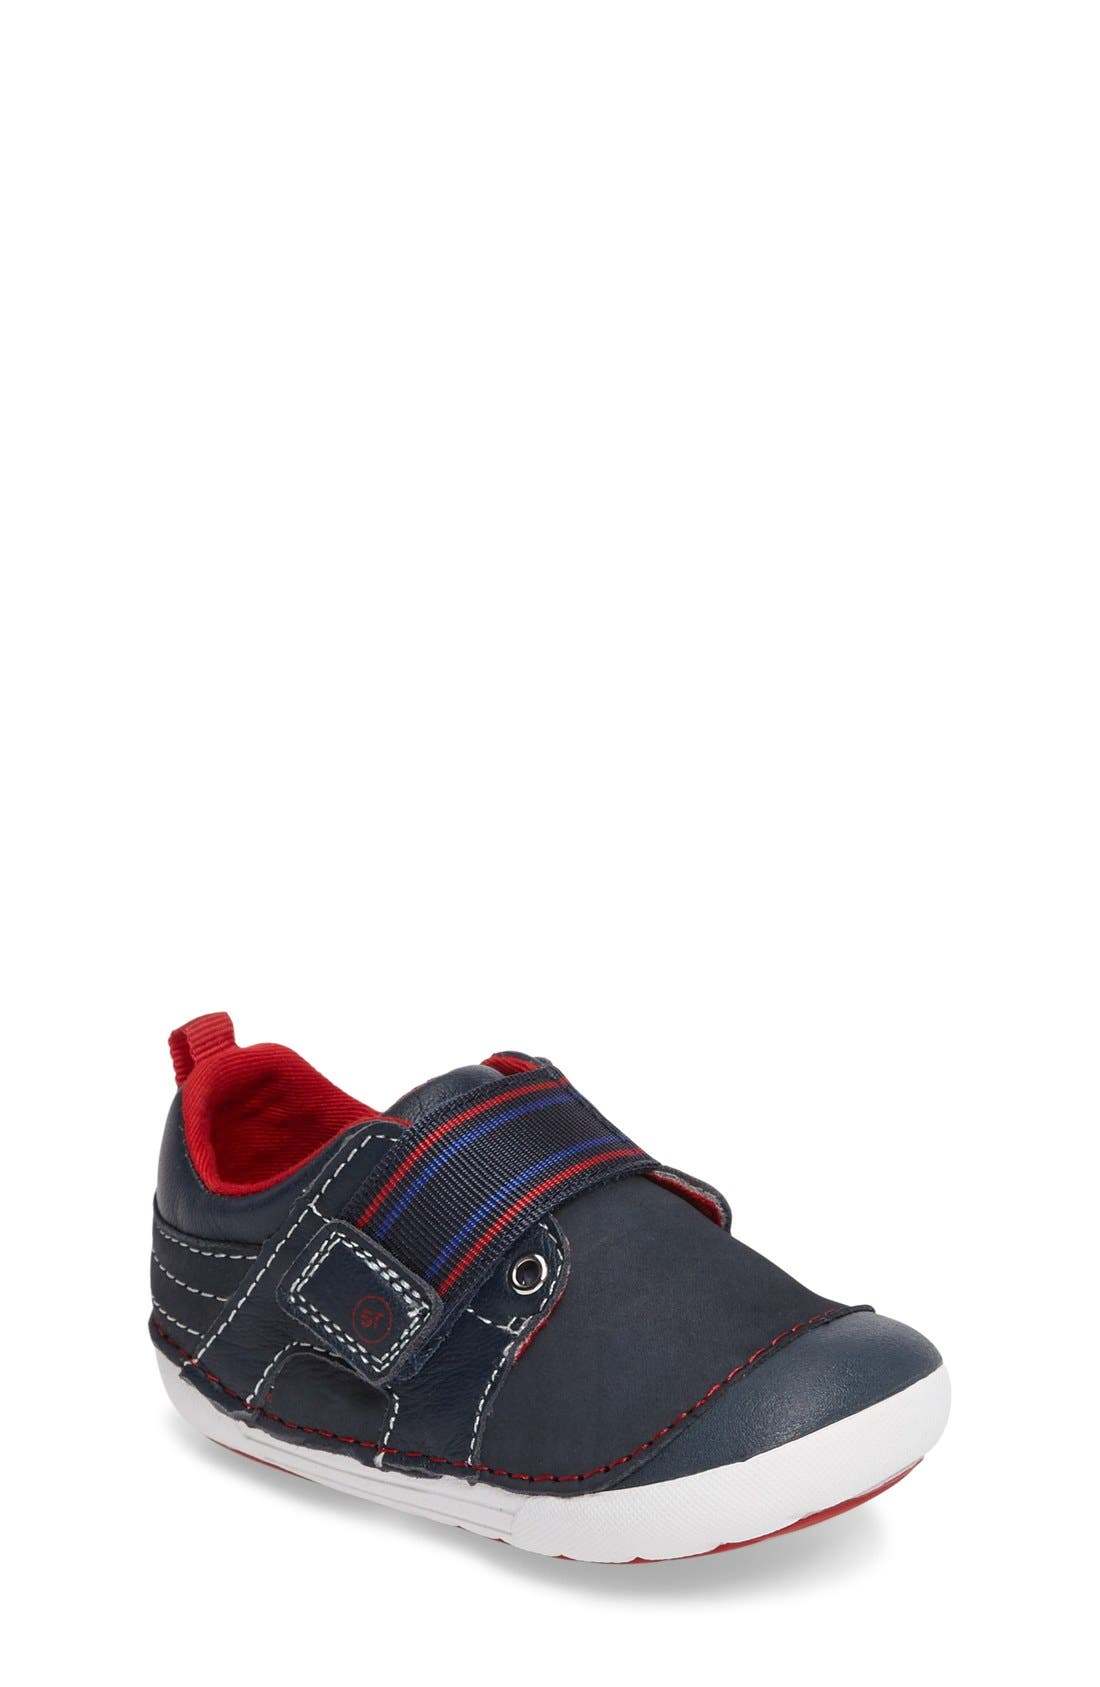 Alternate Image 1 Selected - Stride Rite Soft Motion™ Cameron Sneaker (Baby & Walker)